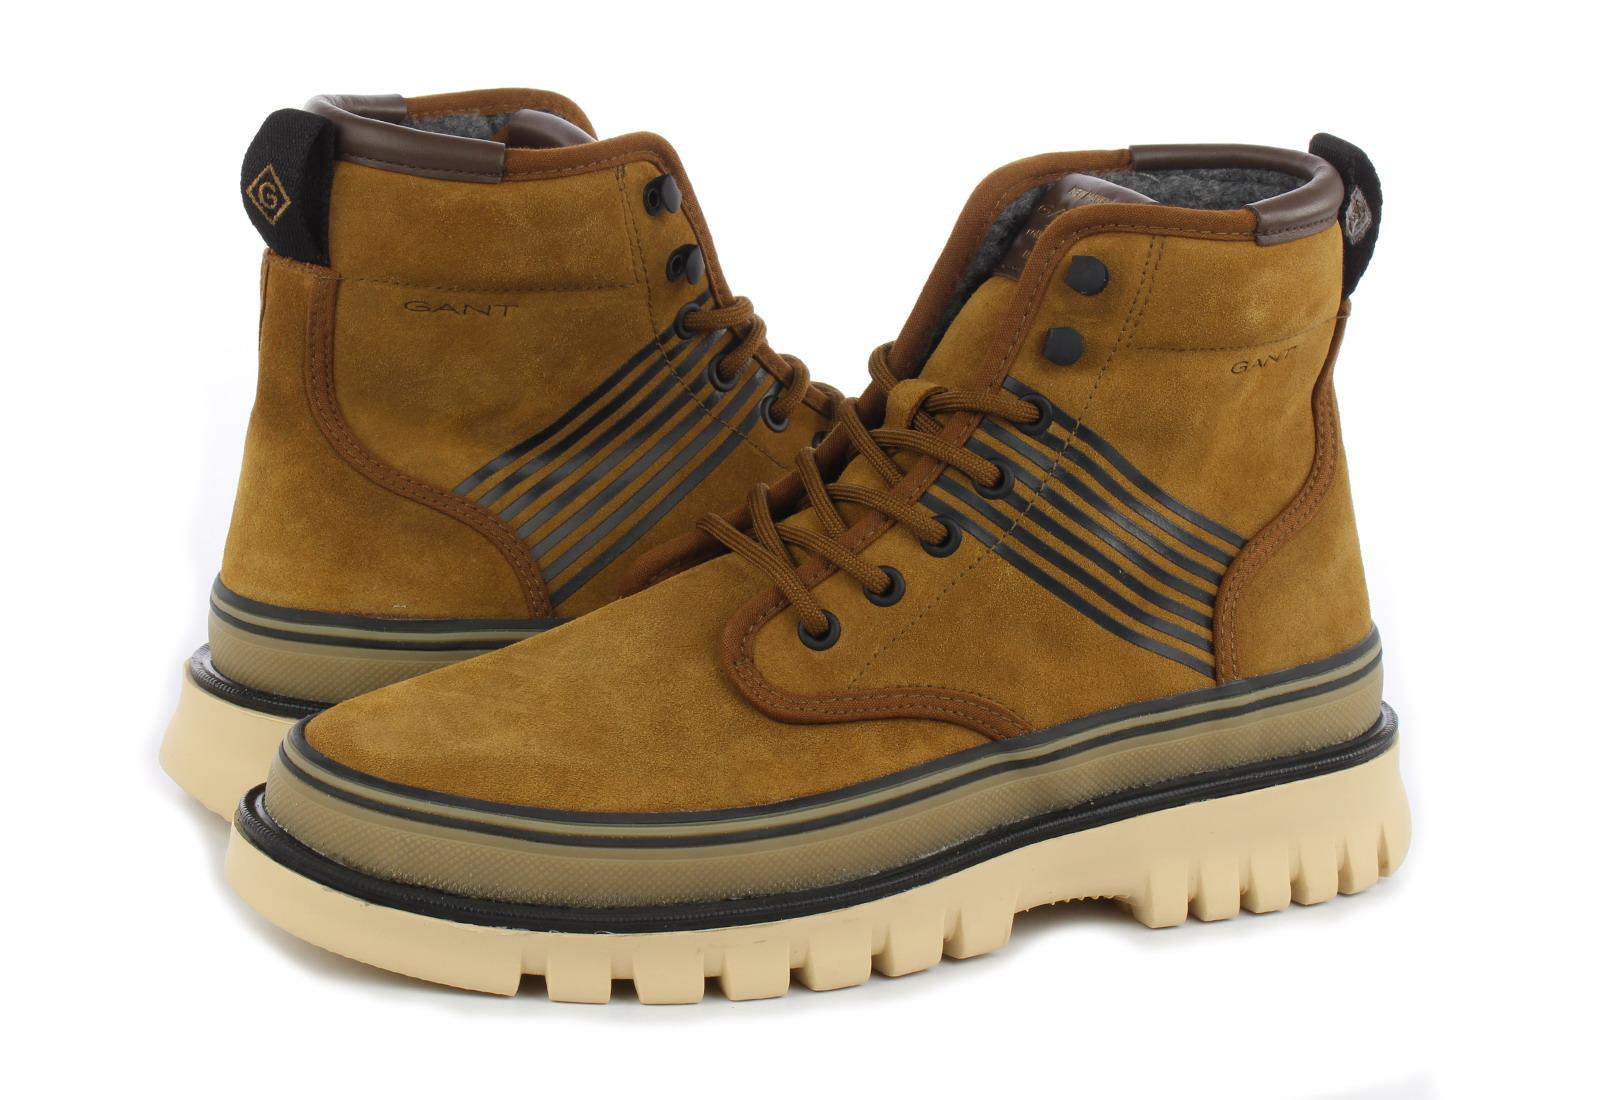 Gant Duboke Cipele Nebrada